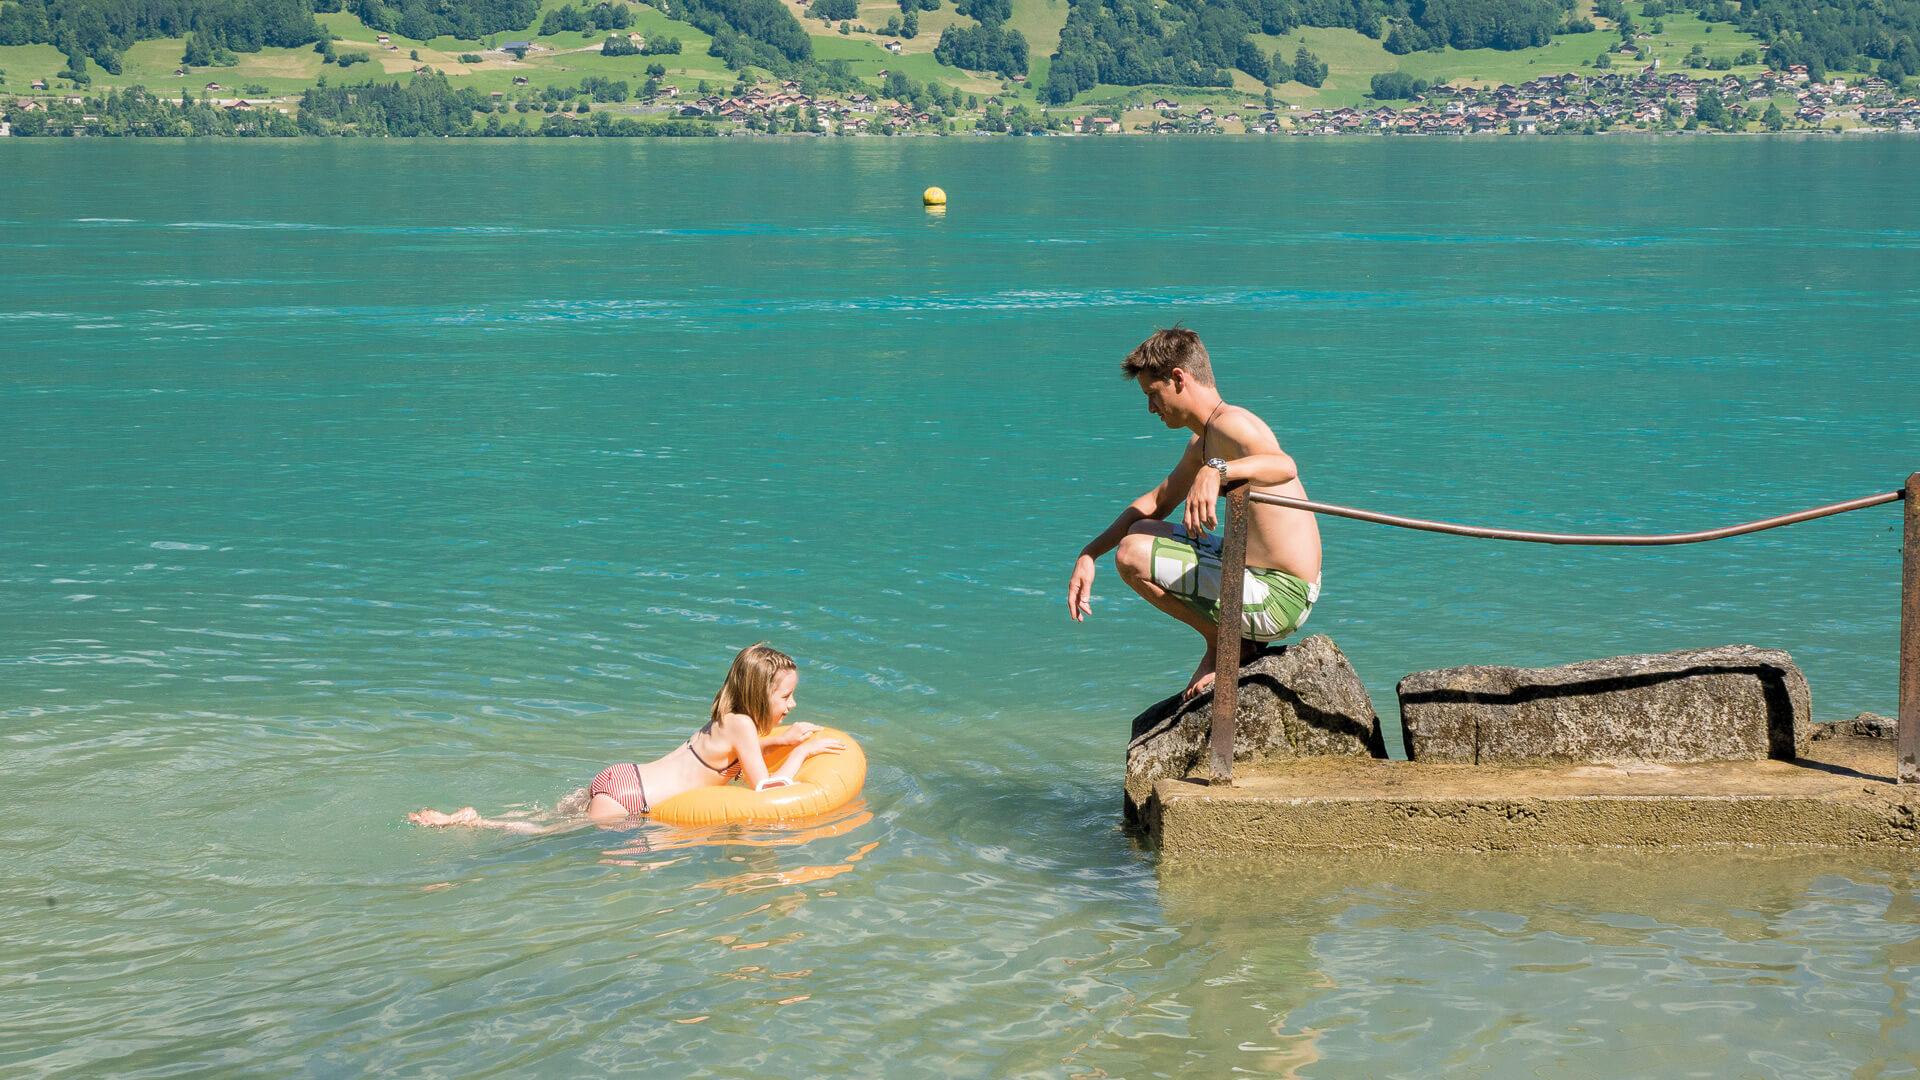 iseltwald-strandbad-sommer-abkuehlung-brienzersee-familie-spass